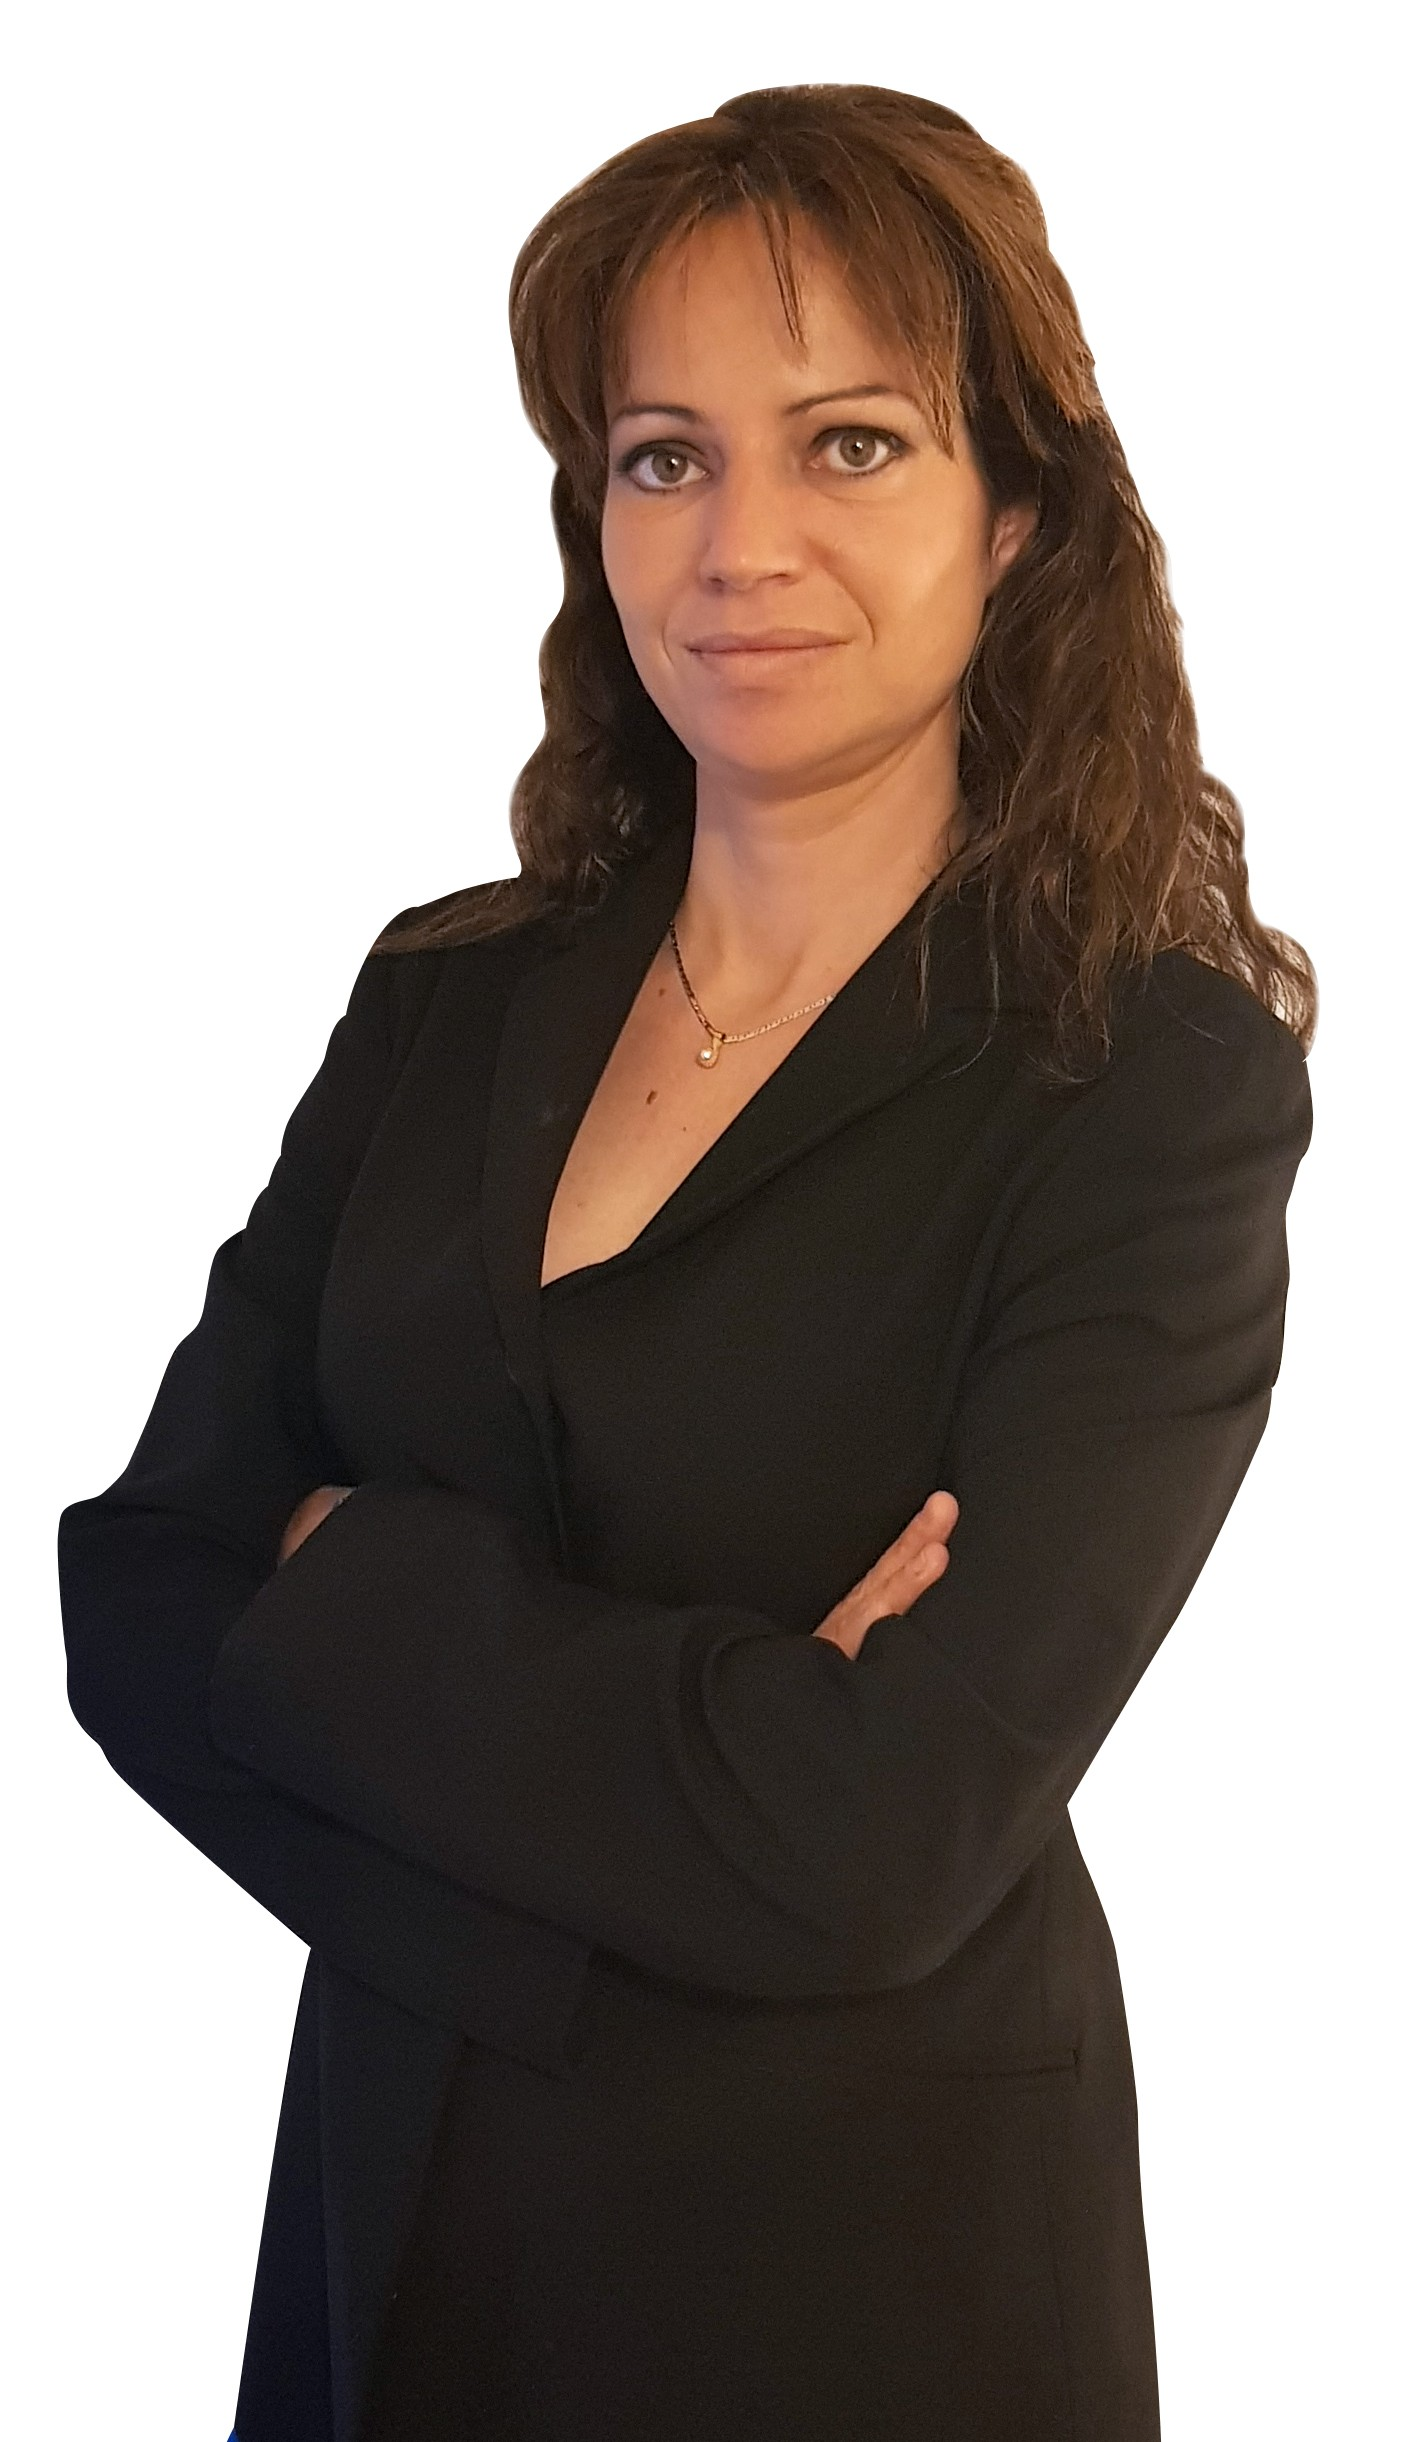 Isabel Leal López